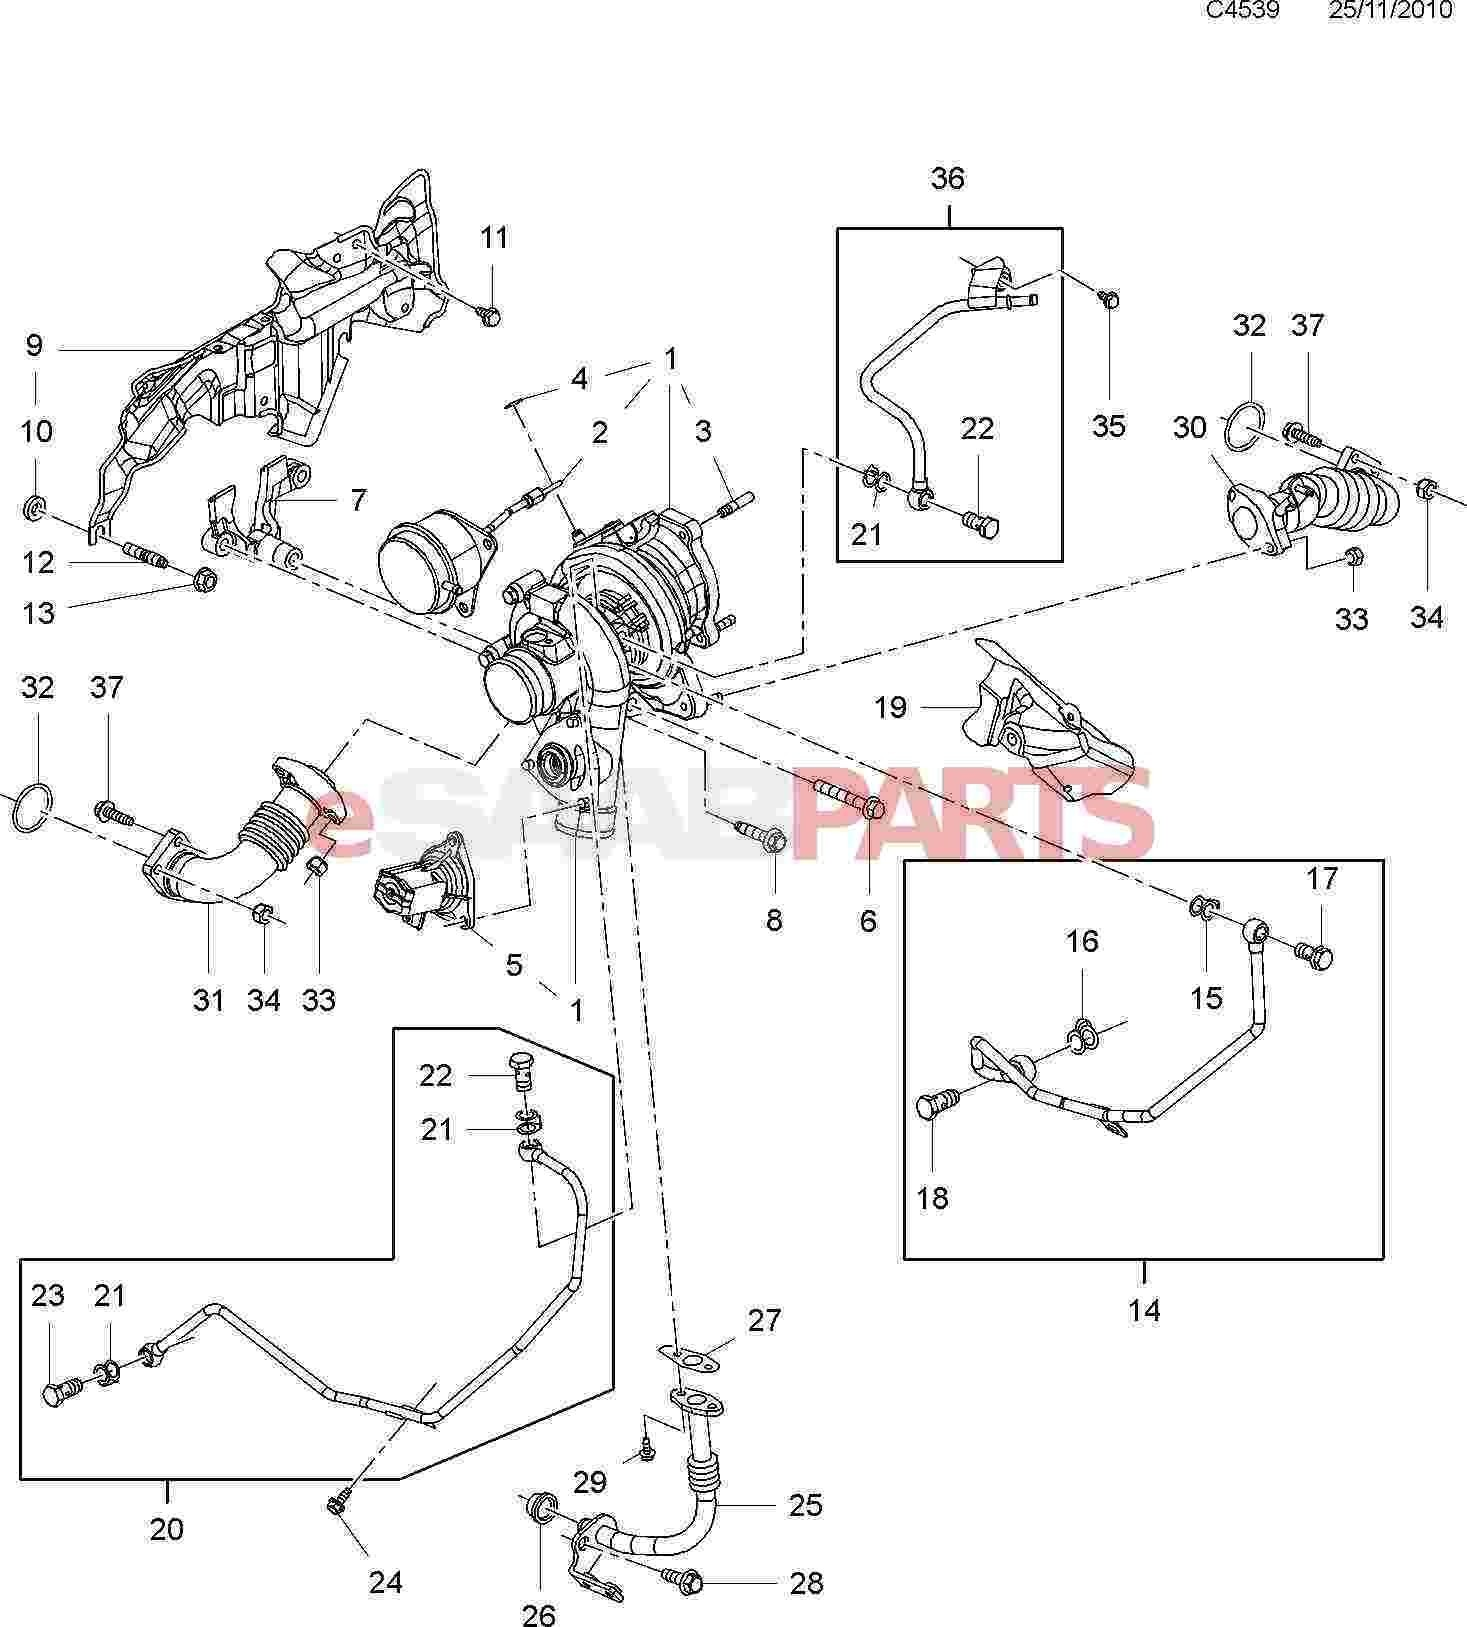 hight resolution of saab 2 3 engine diagram enthusiast wiring diagrams u2022 rh bwpartnersautos com saab saab 9 5